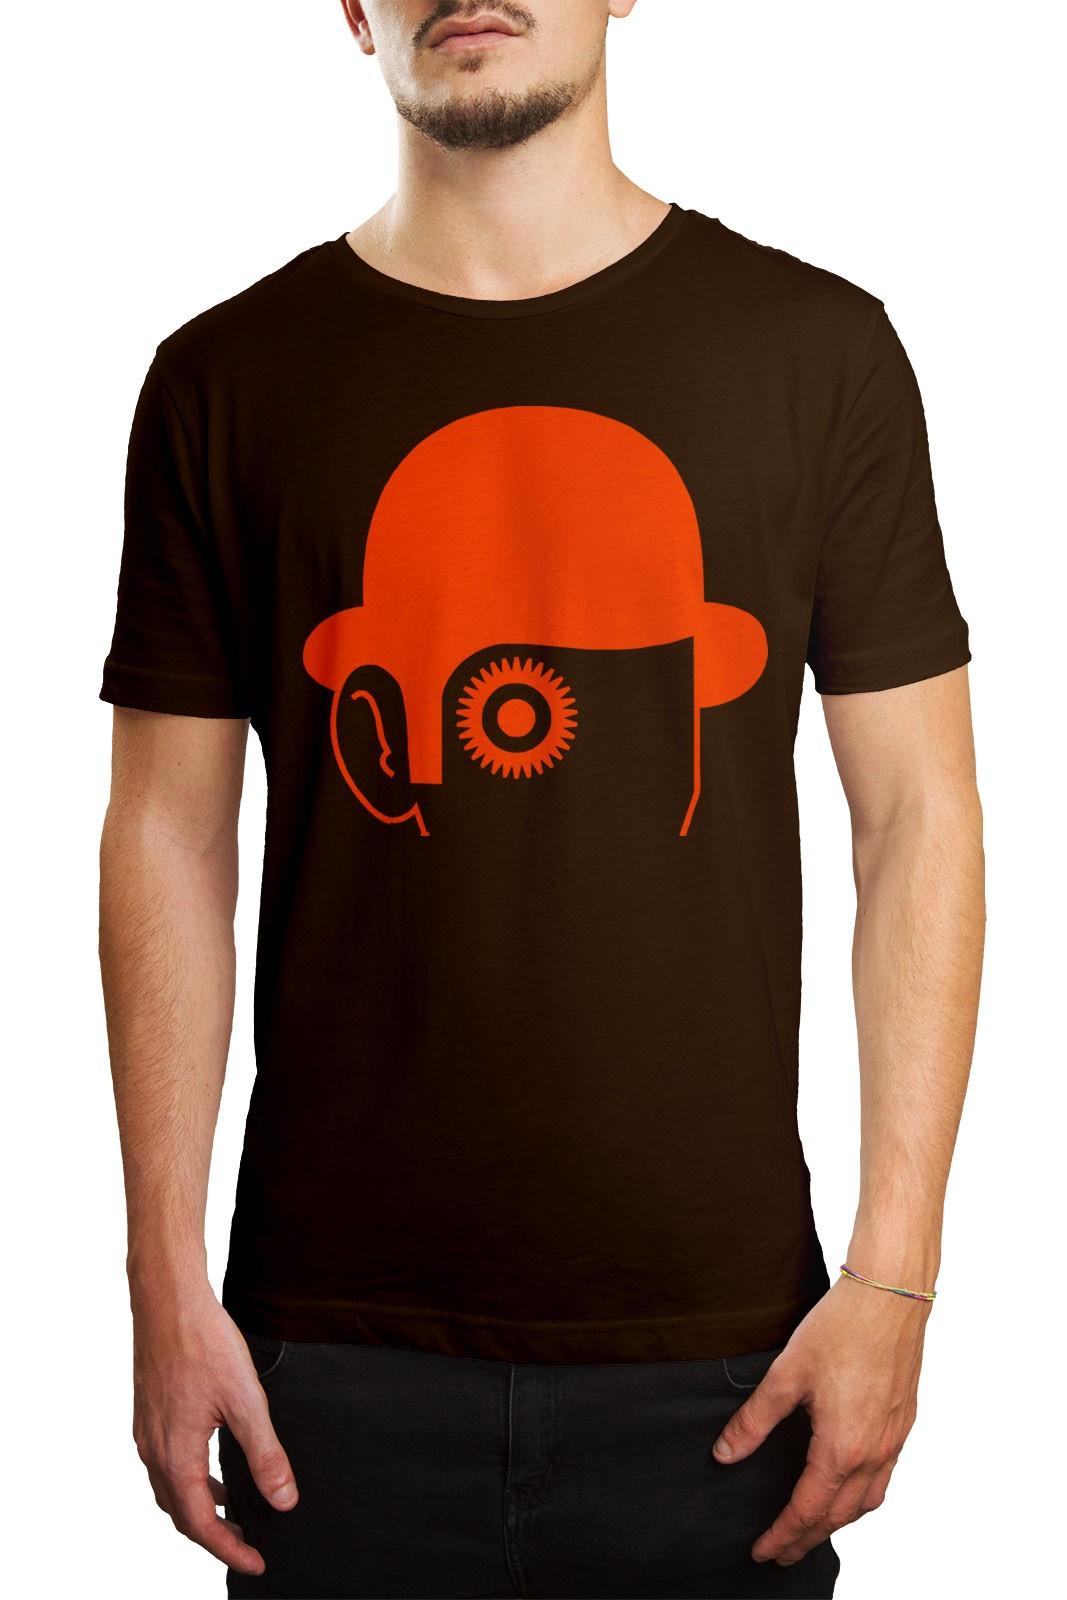 Camiseta HShop Laranja Mecânica Marrom  - HShop